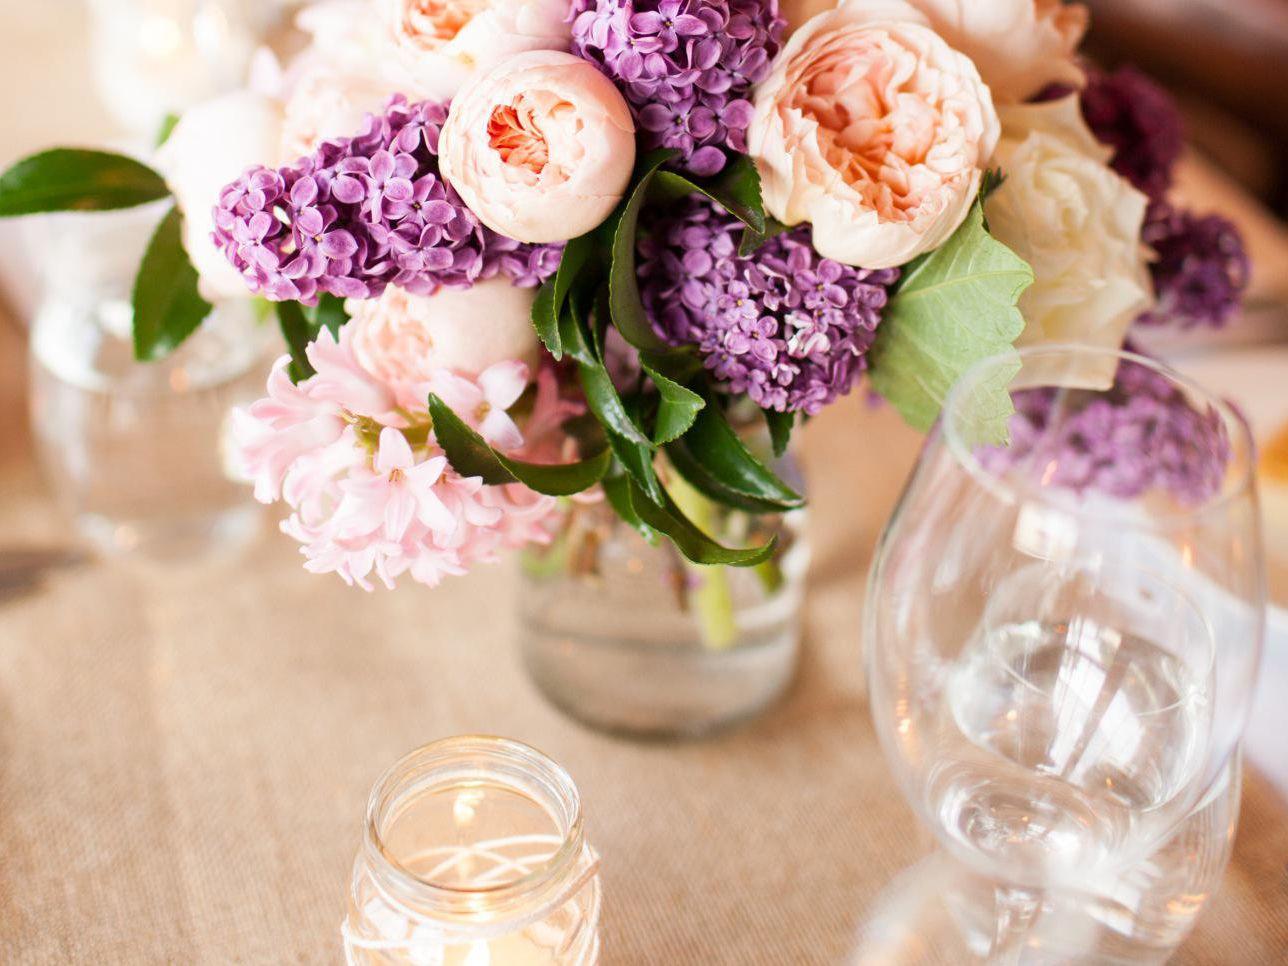 flower decoration for wedding reception.htm how to make wedding flower arrangements and bouquets  wedding flower arrangements and bouquets